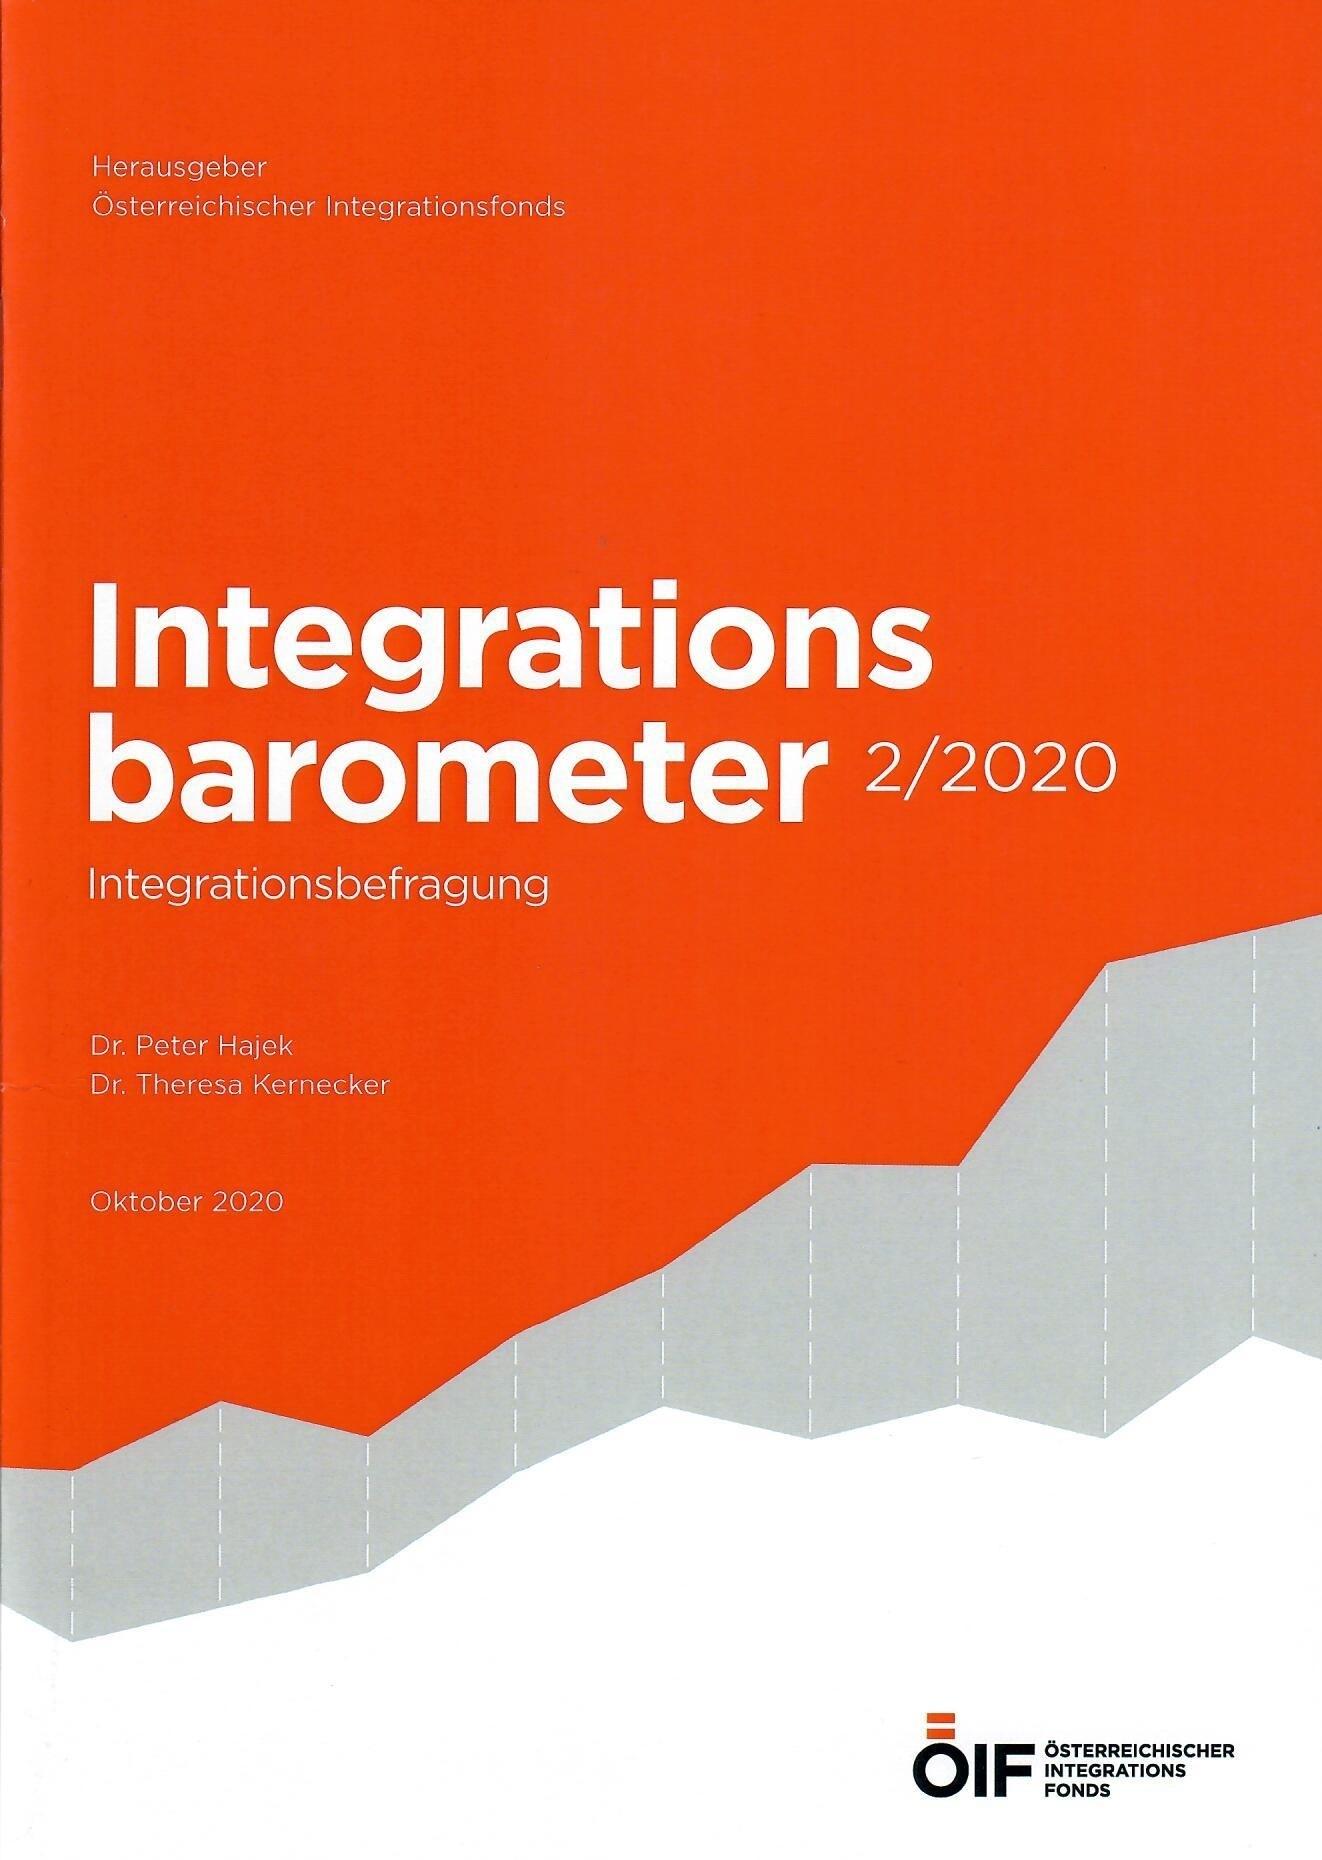 Integrationsbarometer 2/2020